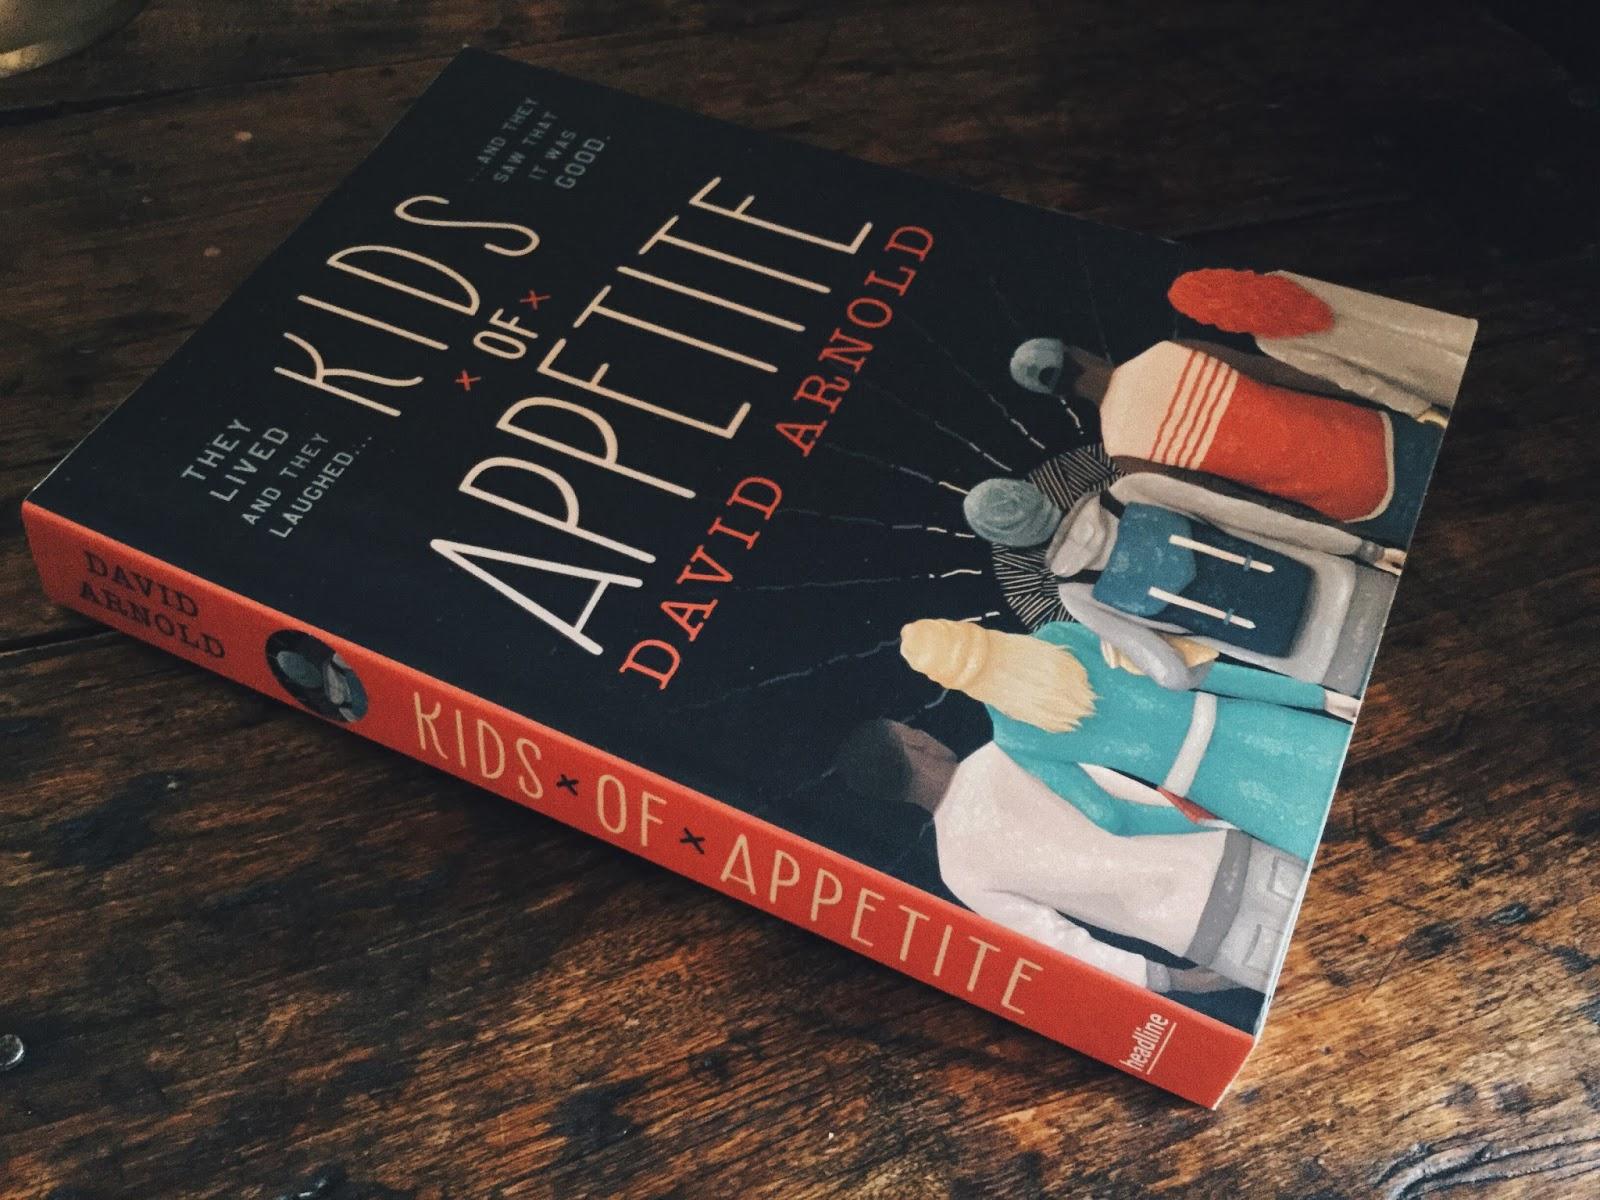 LIVRE Kids of Appetite - David Arnold